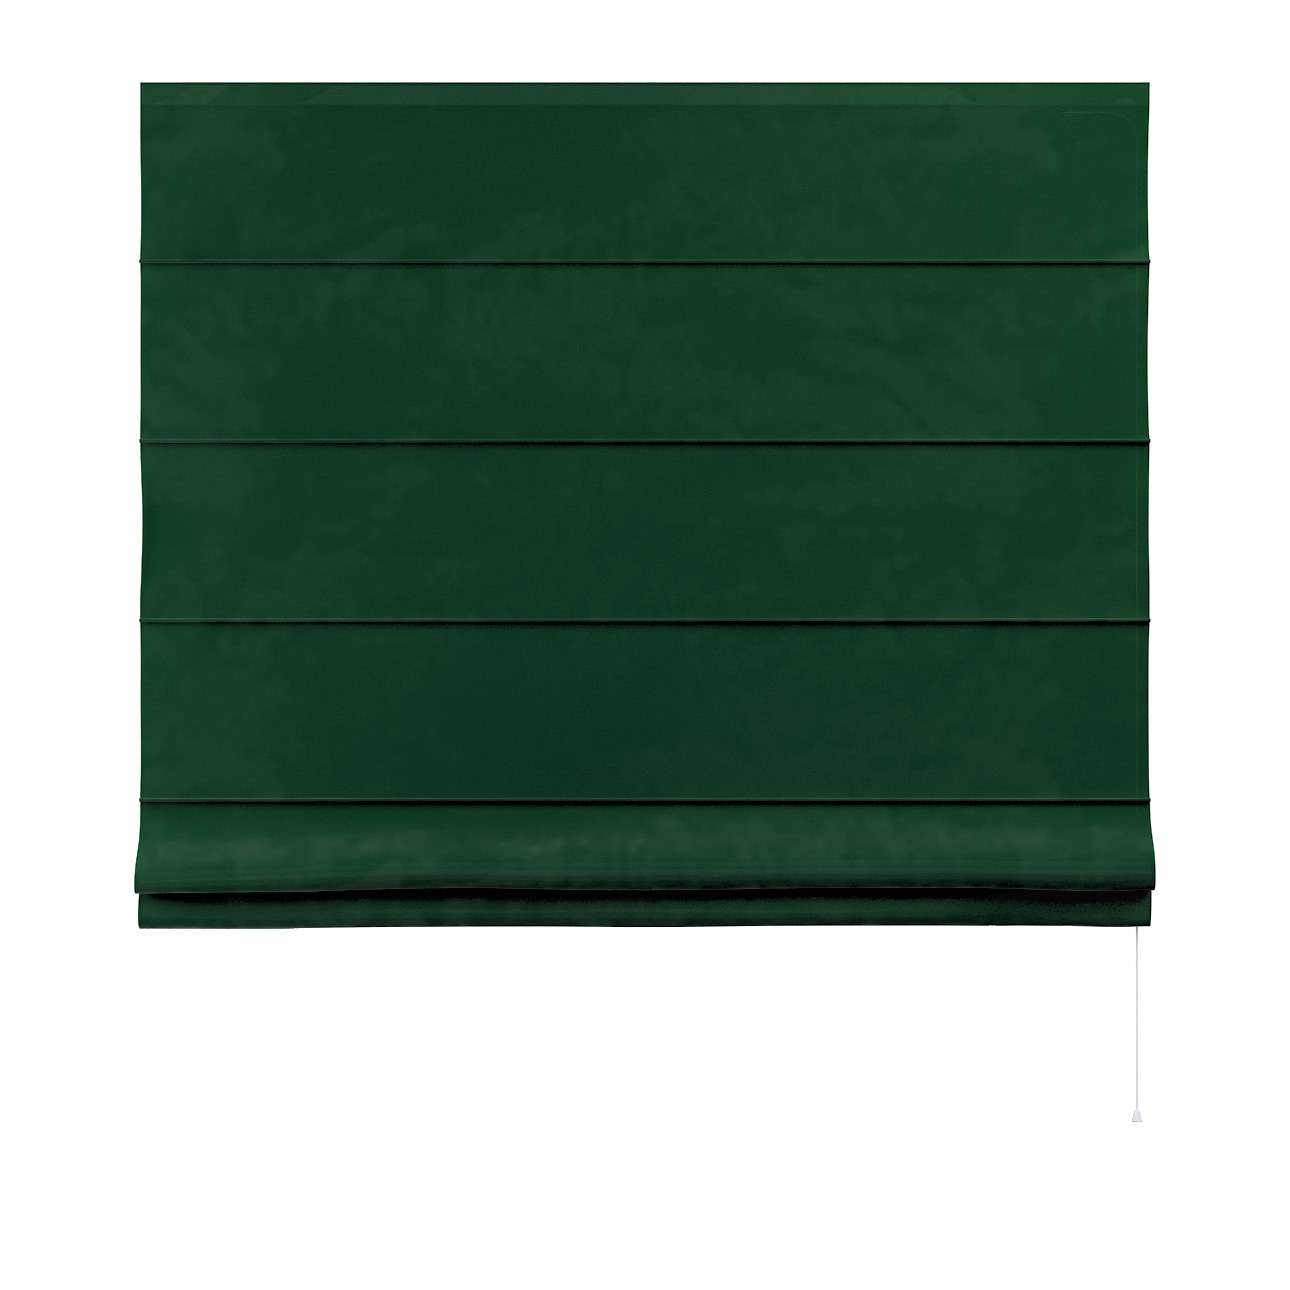 Rímska roleta Capri V kolekcii Velvet, tkanina: 704-13